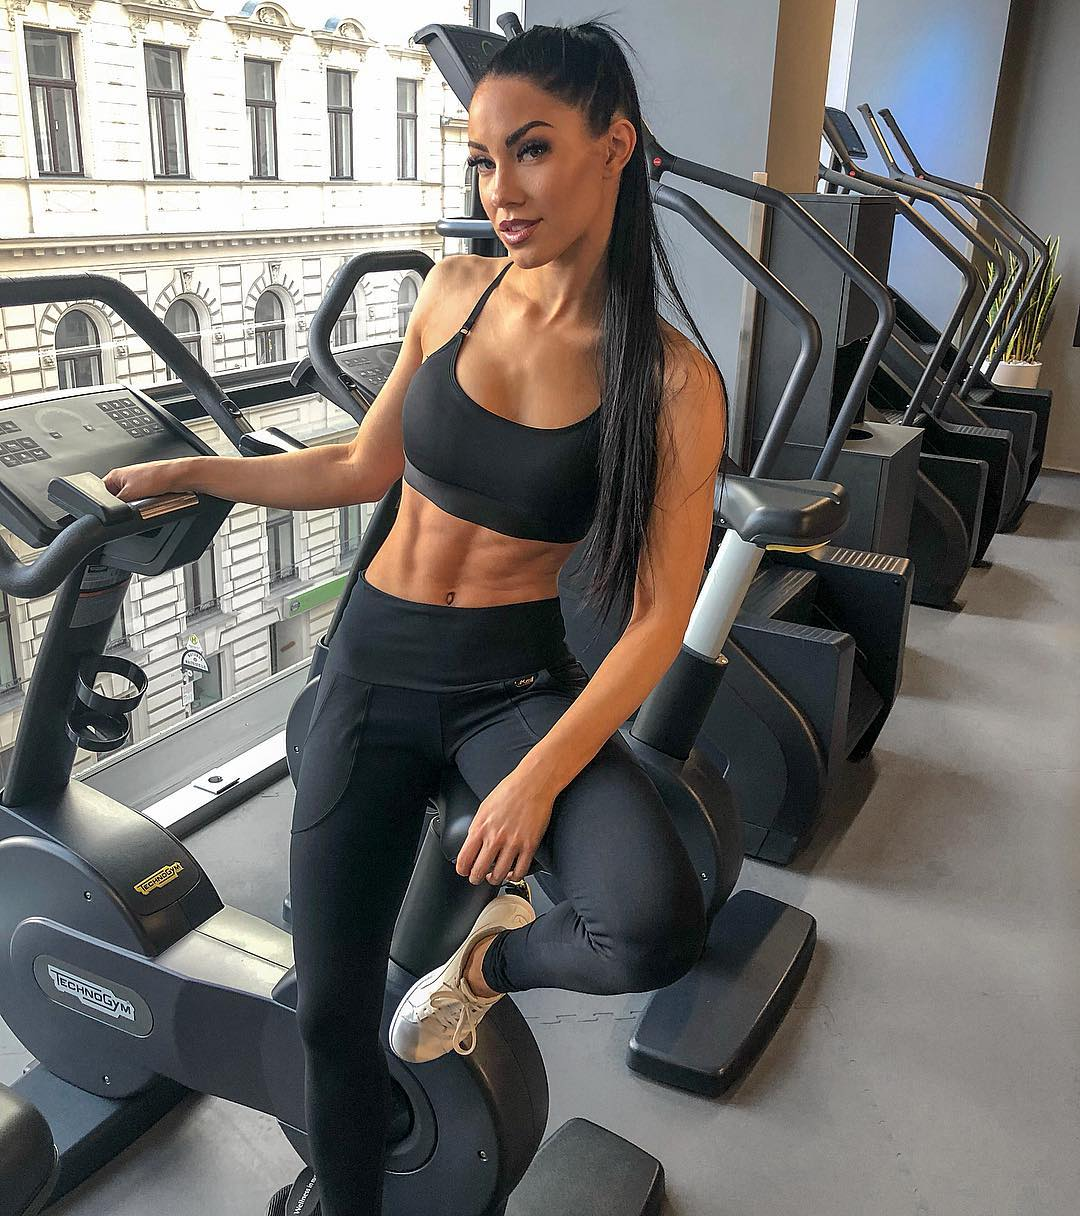 stephanie davis fitness